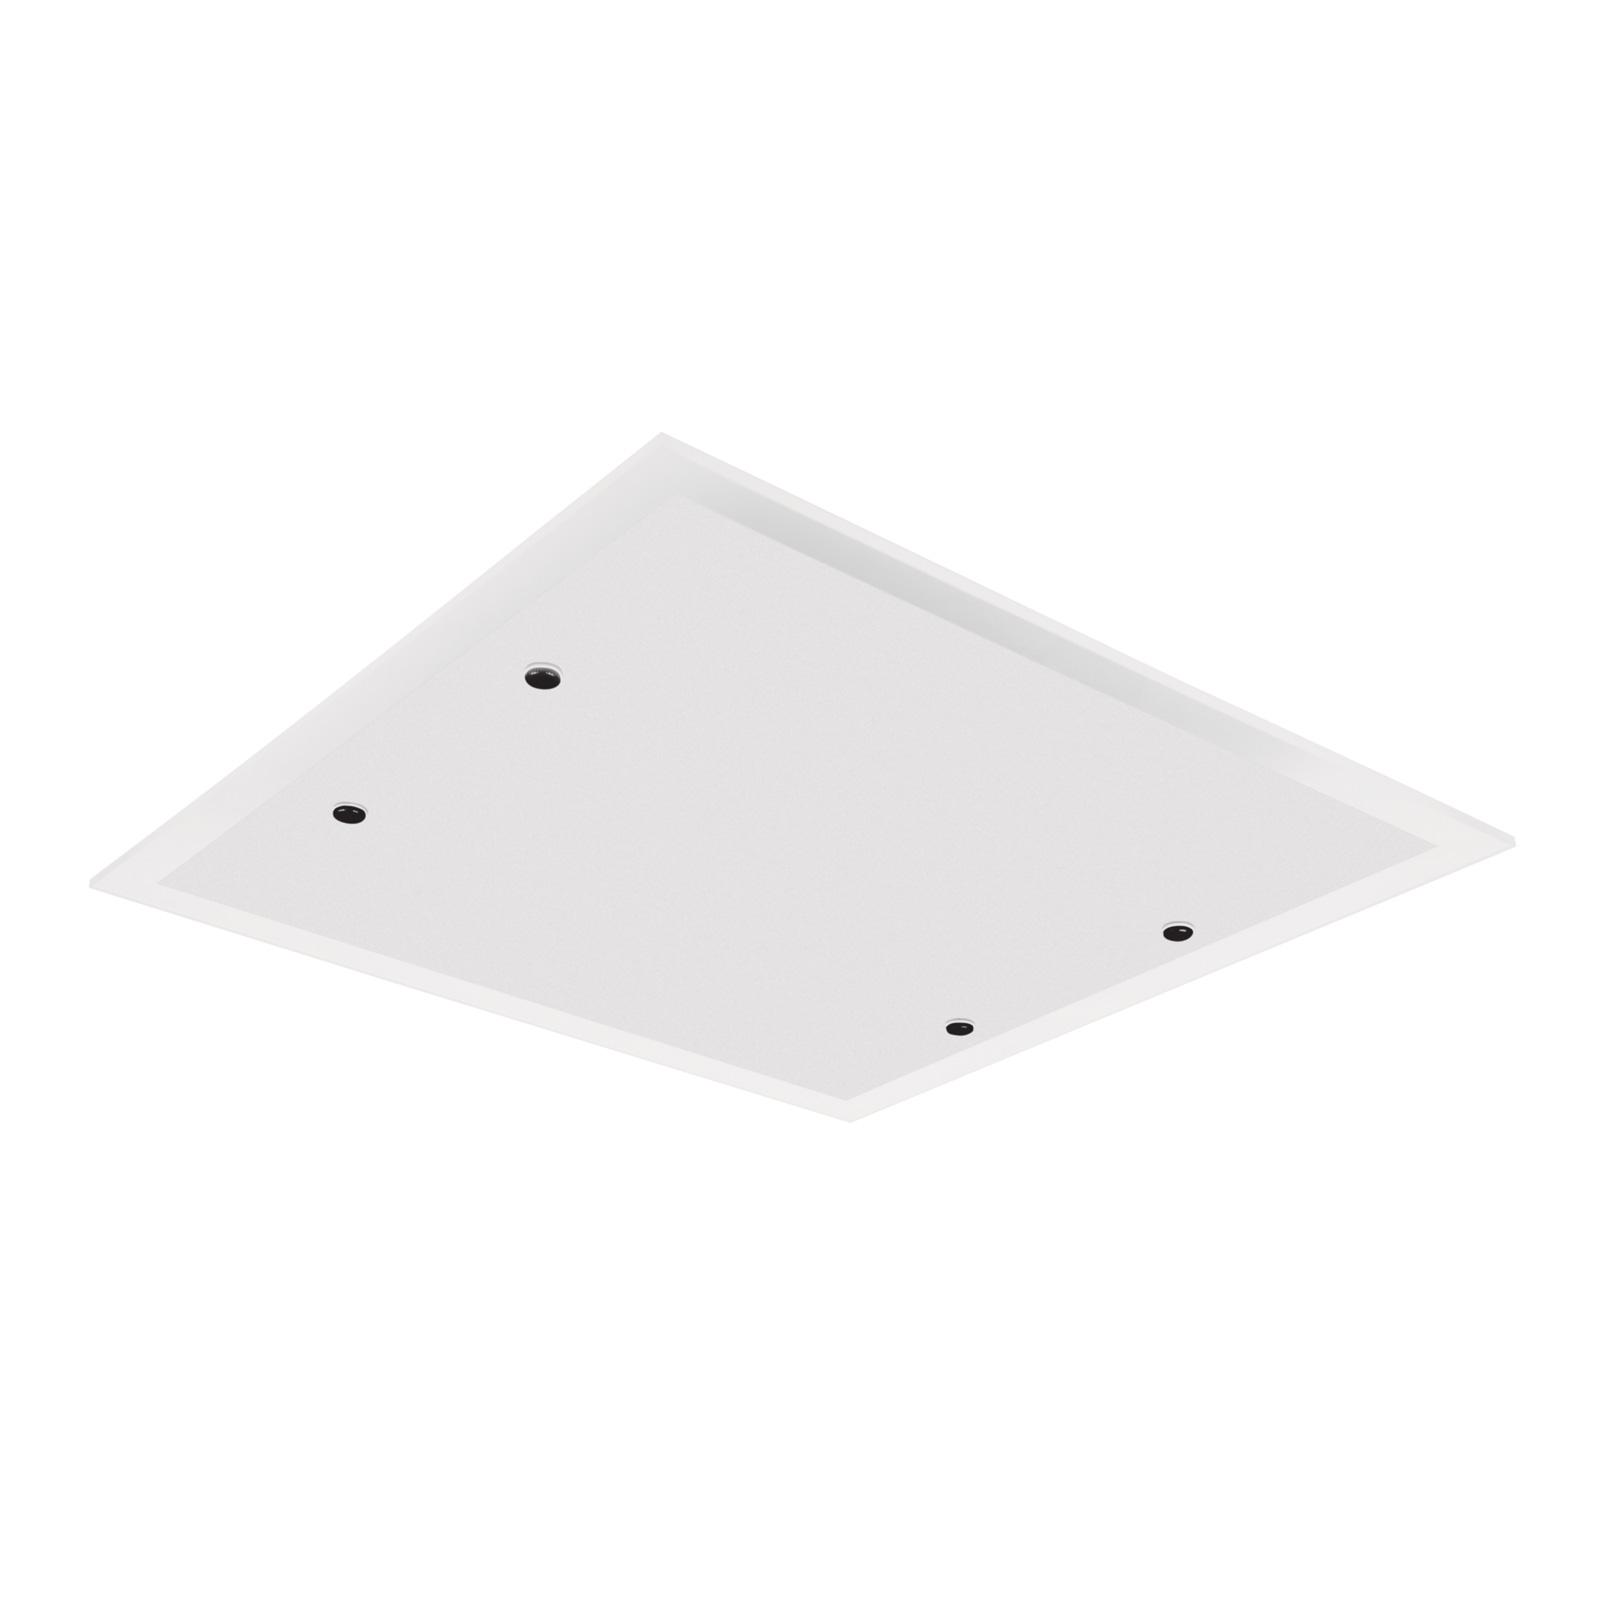 LEDVANCE Lunive Area LED-Deckenleuchte 30cm 4.000K